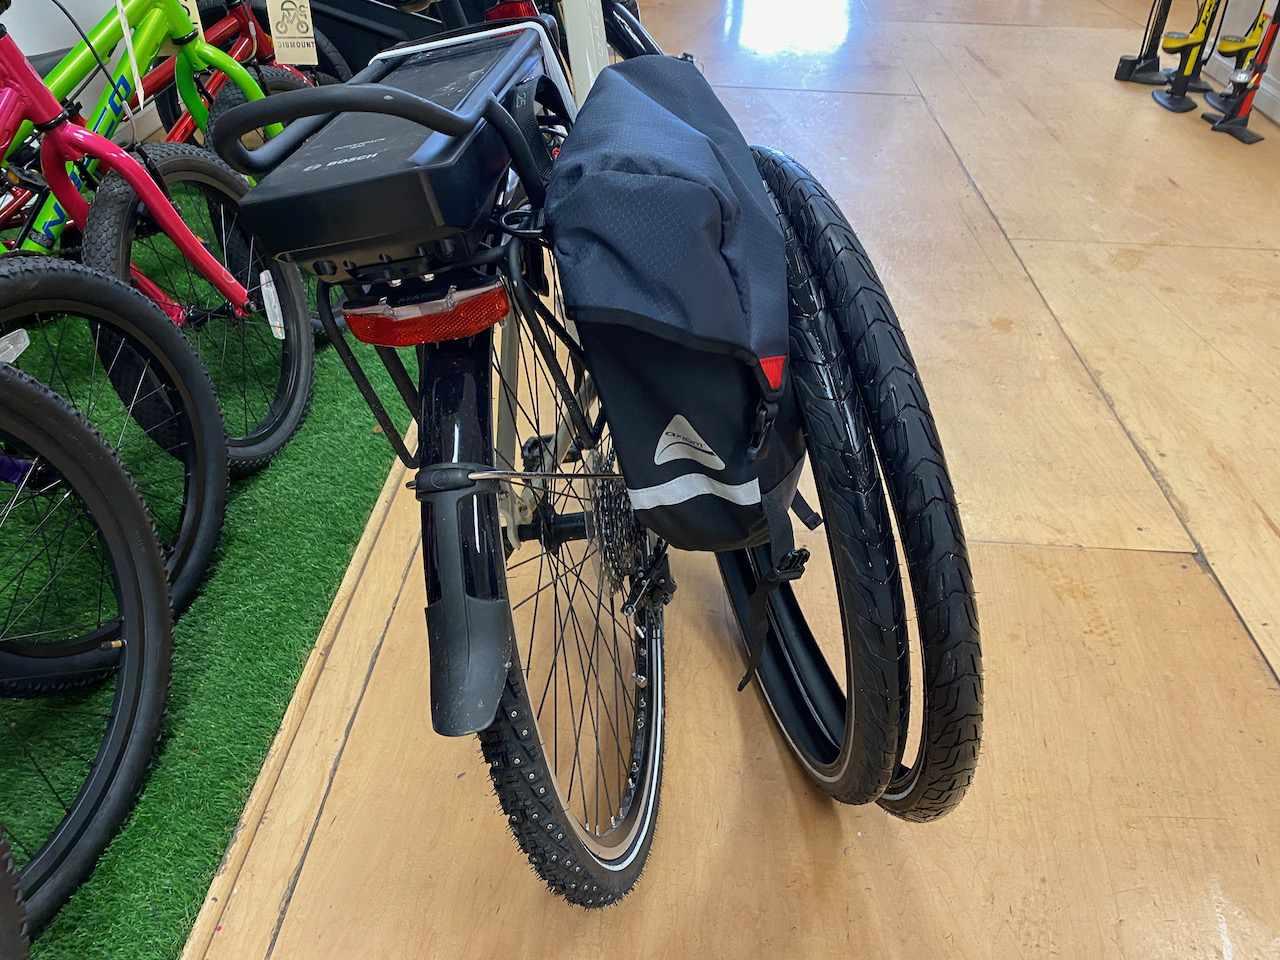 Studded tires on bike